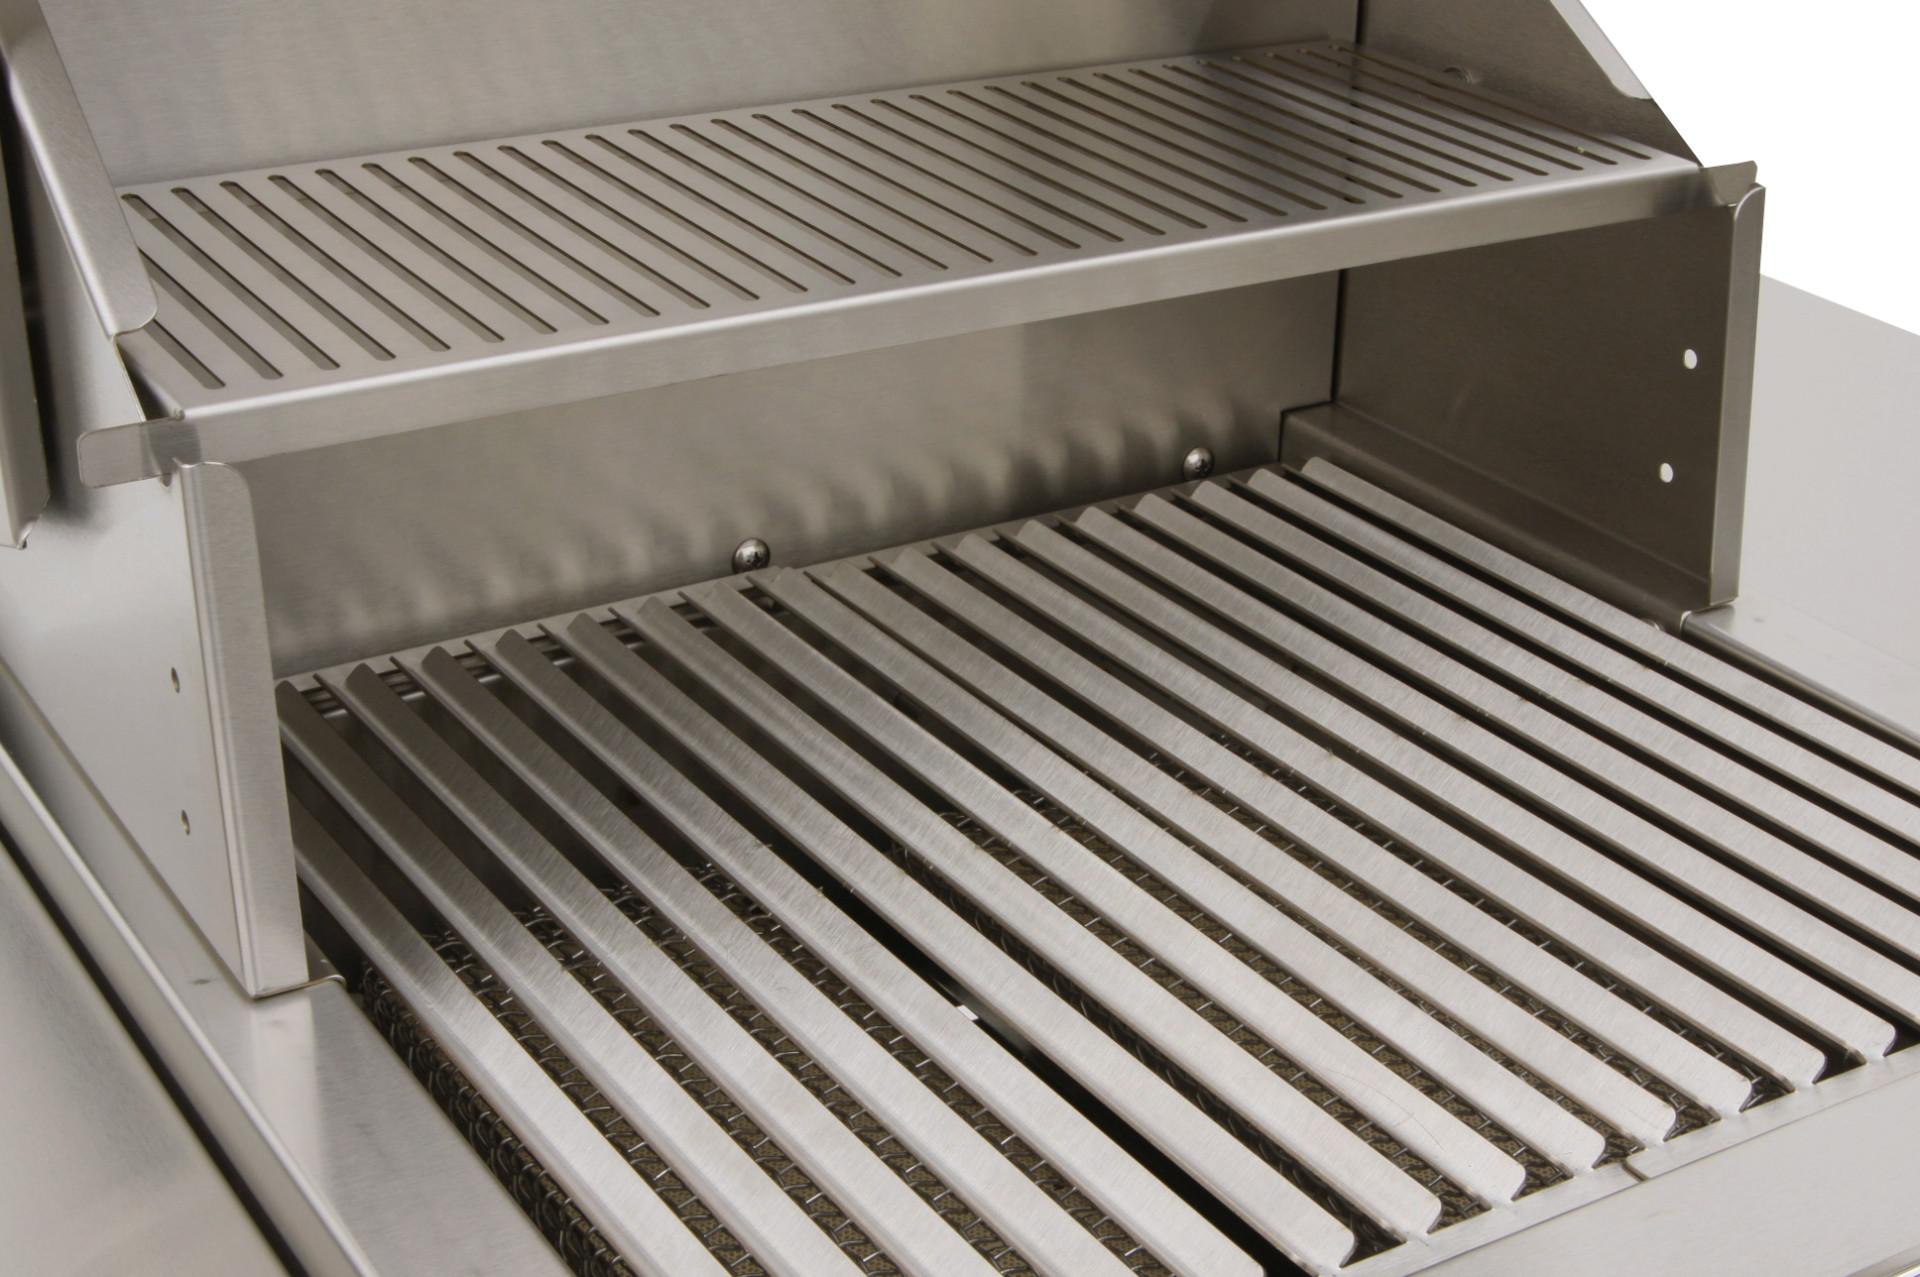 IRBQ-21G-PED_detail-grate-warming-rack_2-r100-w1920